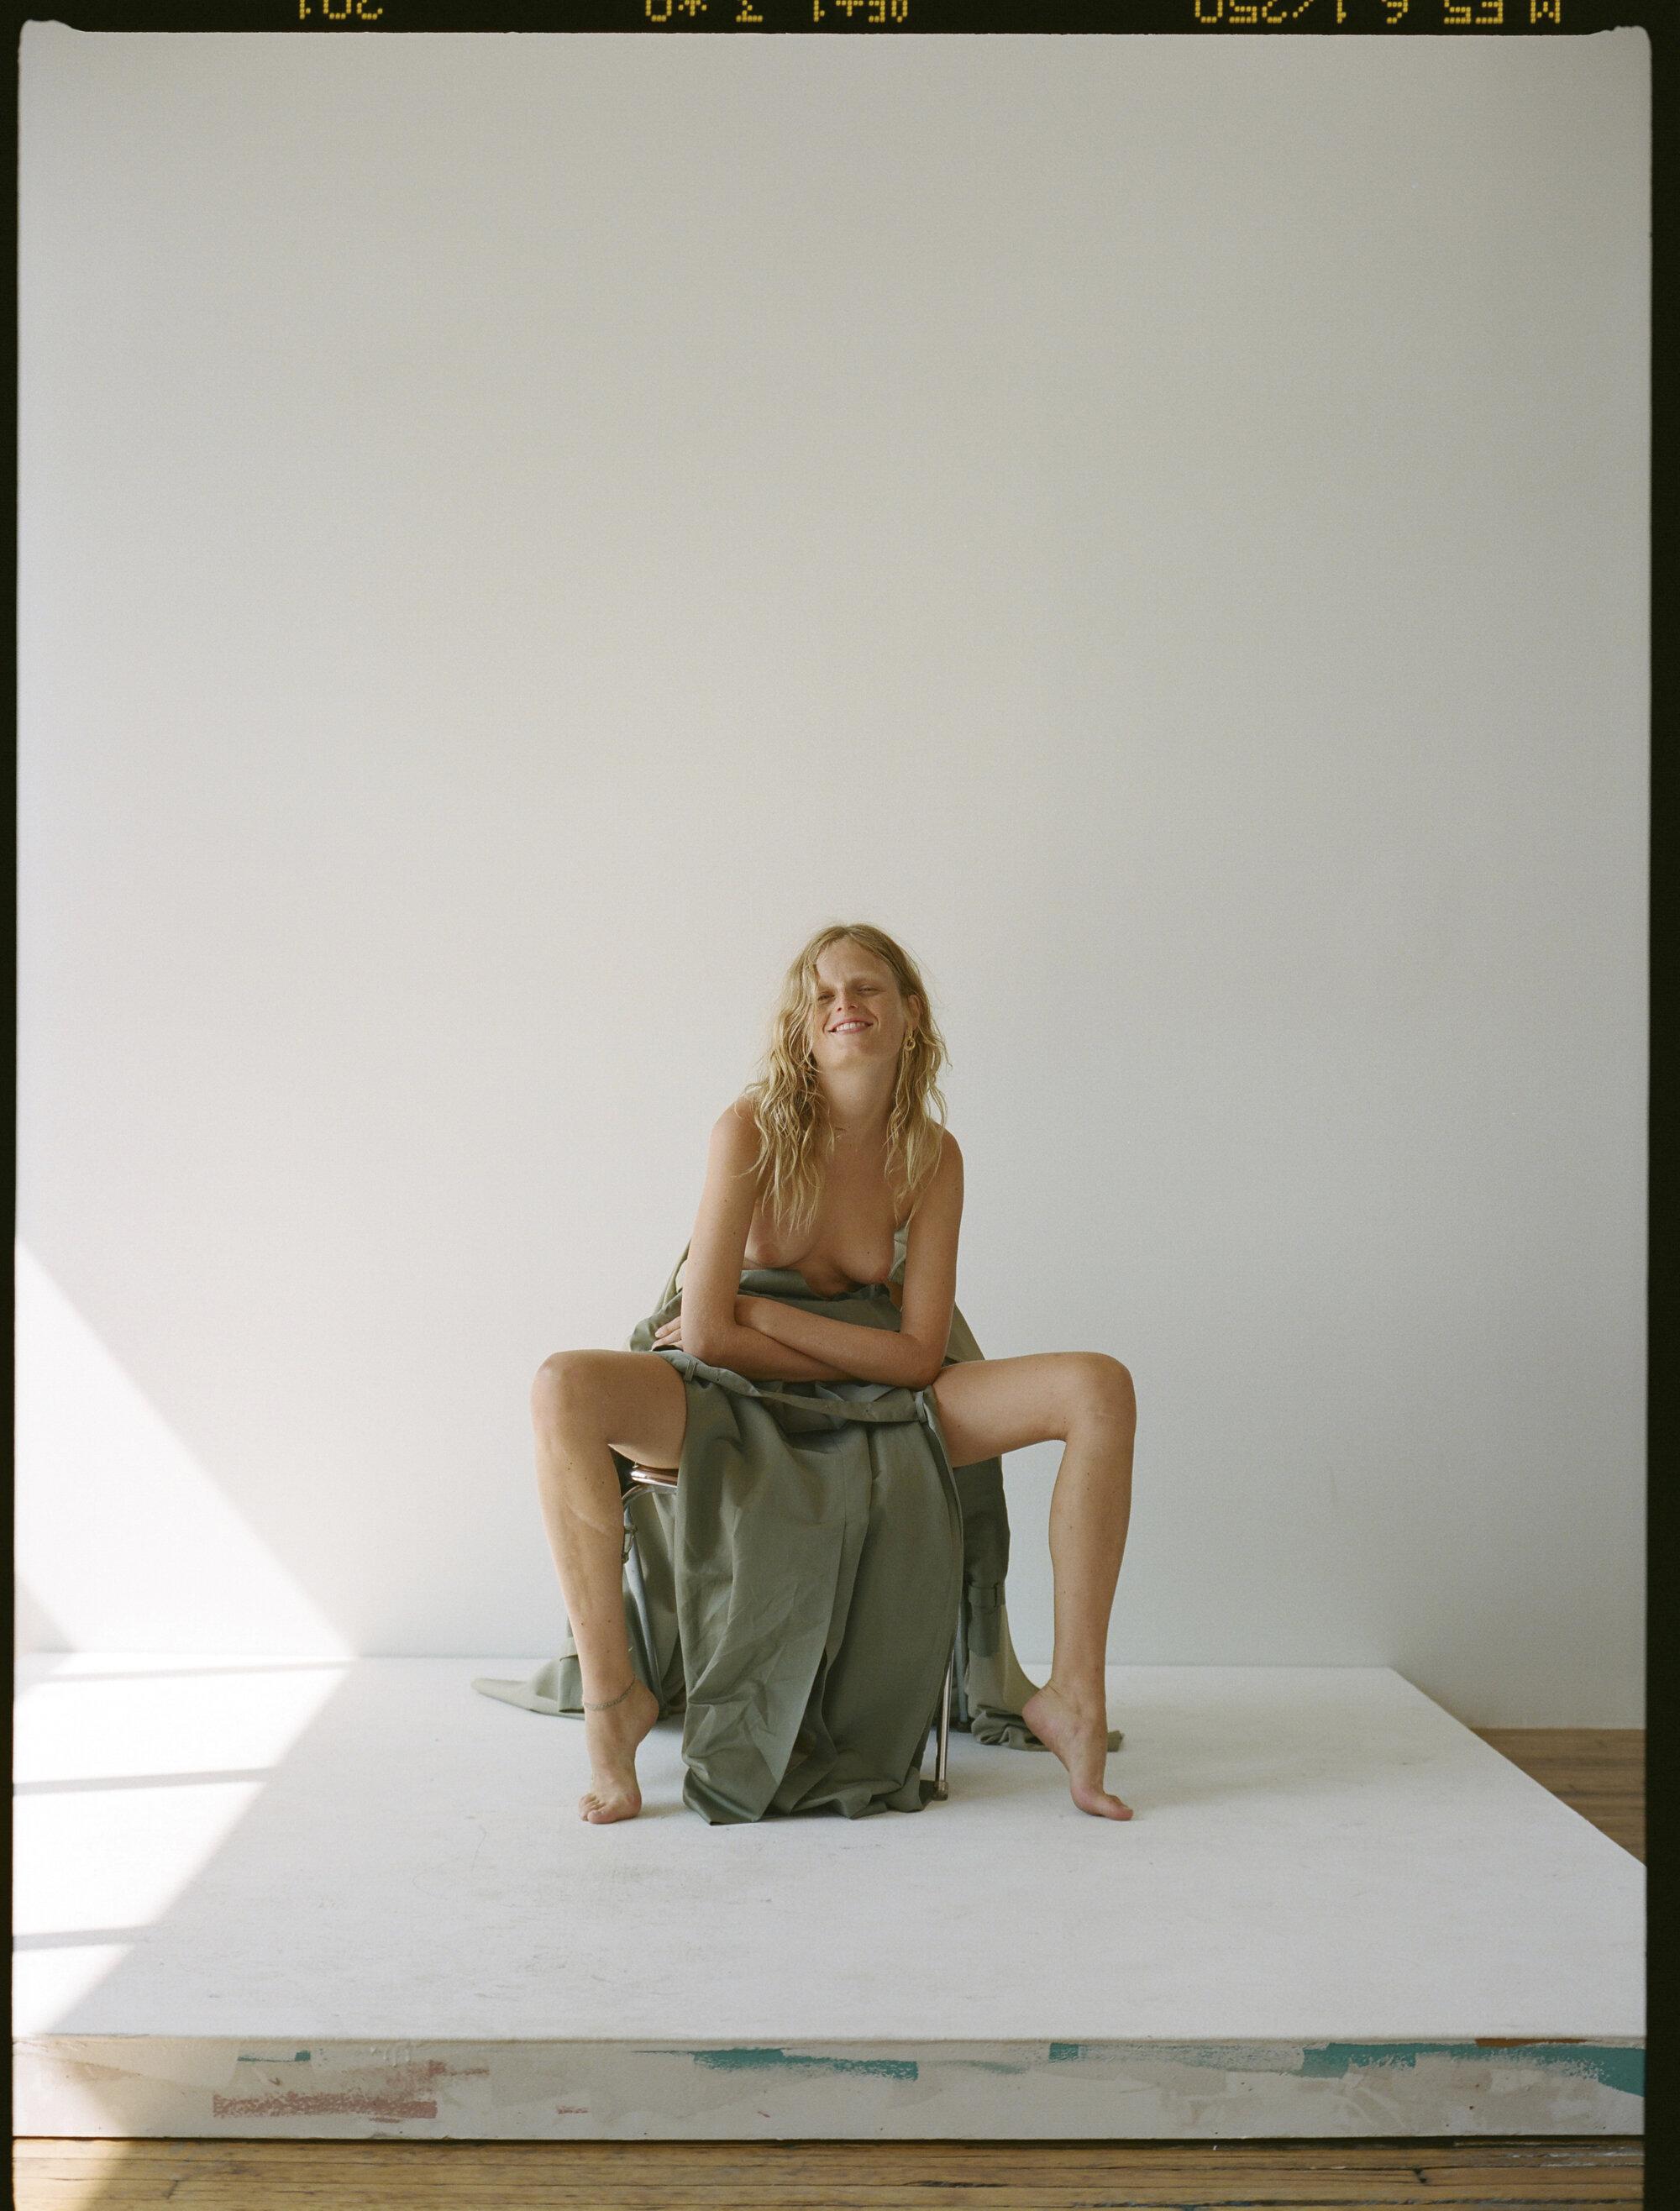 Hanne-Gab-Odiele-by-Mark-Rabadanr-Collection-Issue 5.jpg